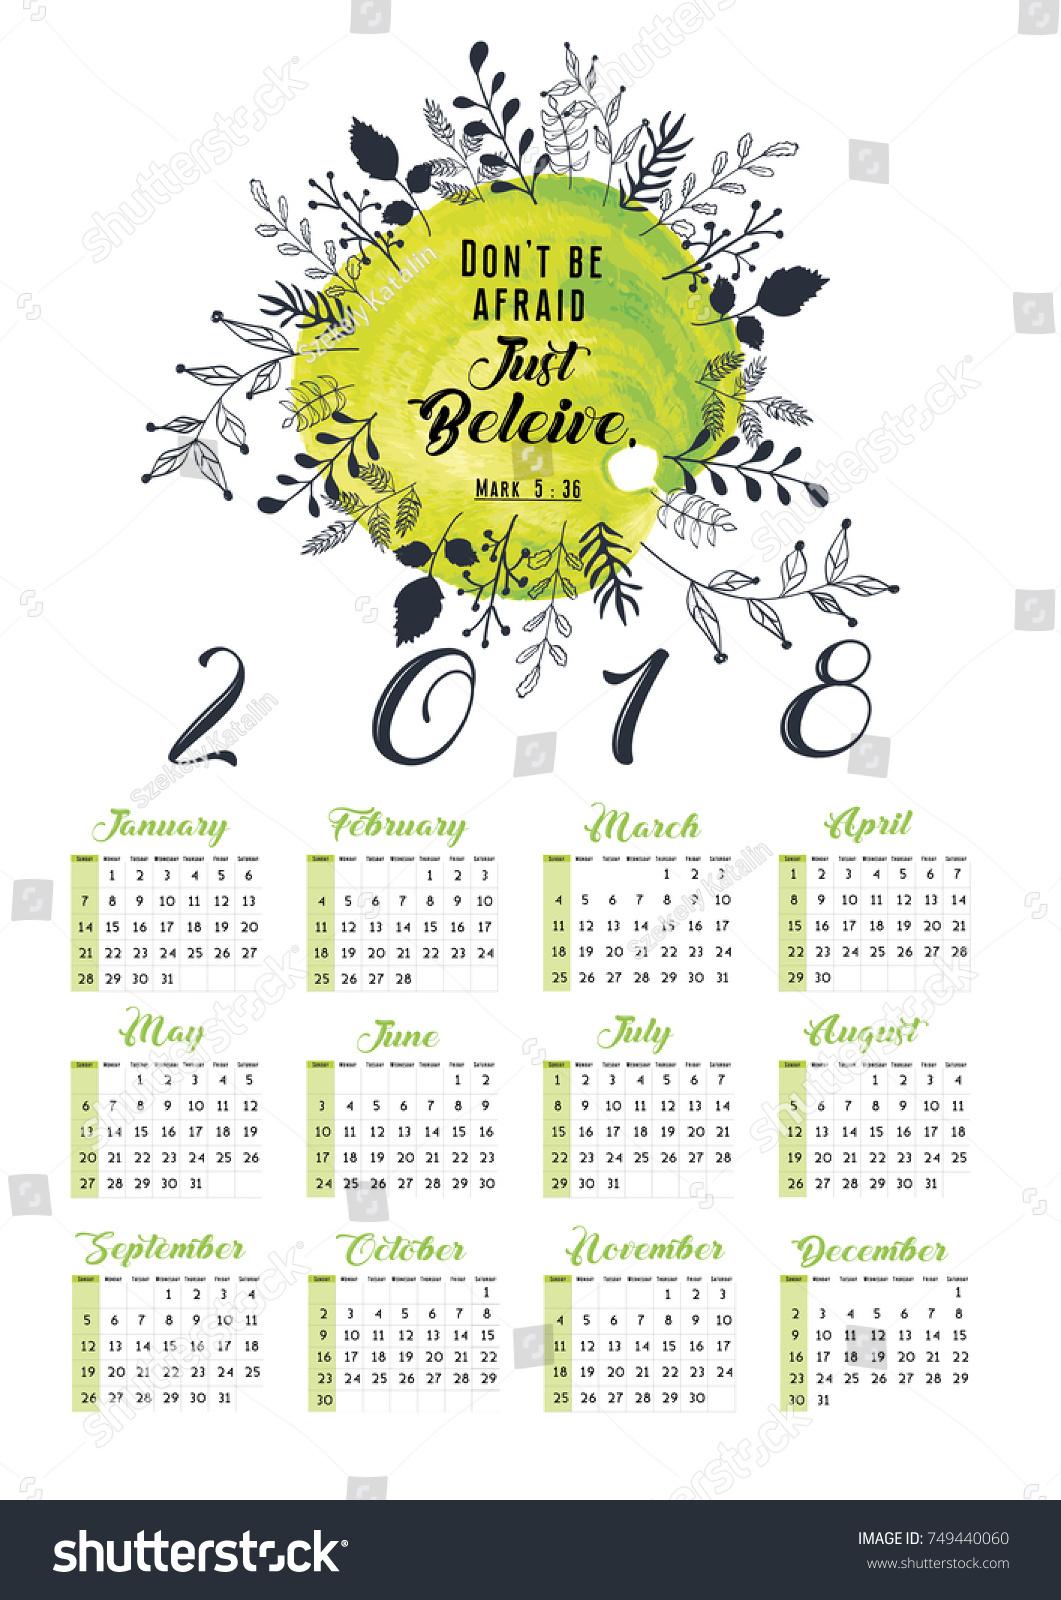 Calendar Design Quote : Calendar bible quote wreath design stock vector royalty free